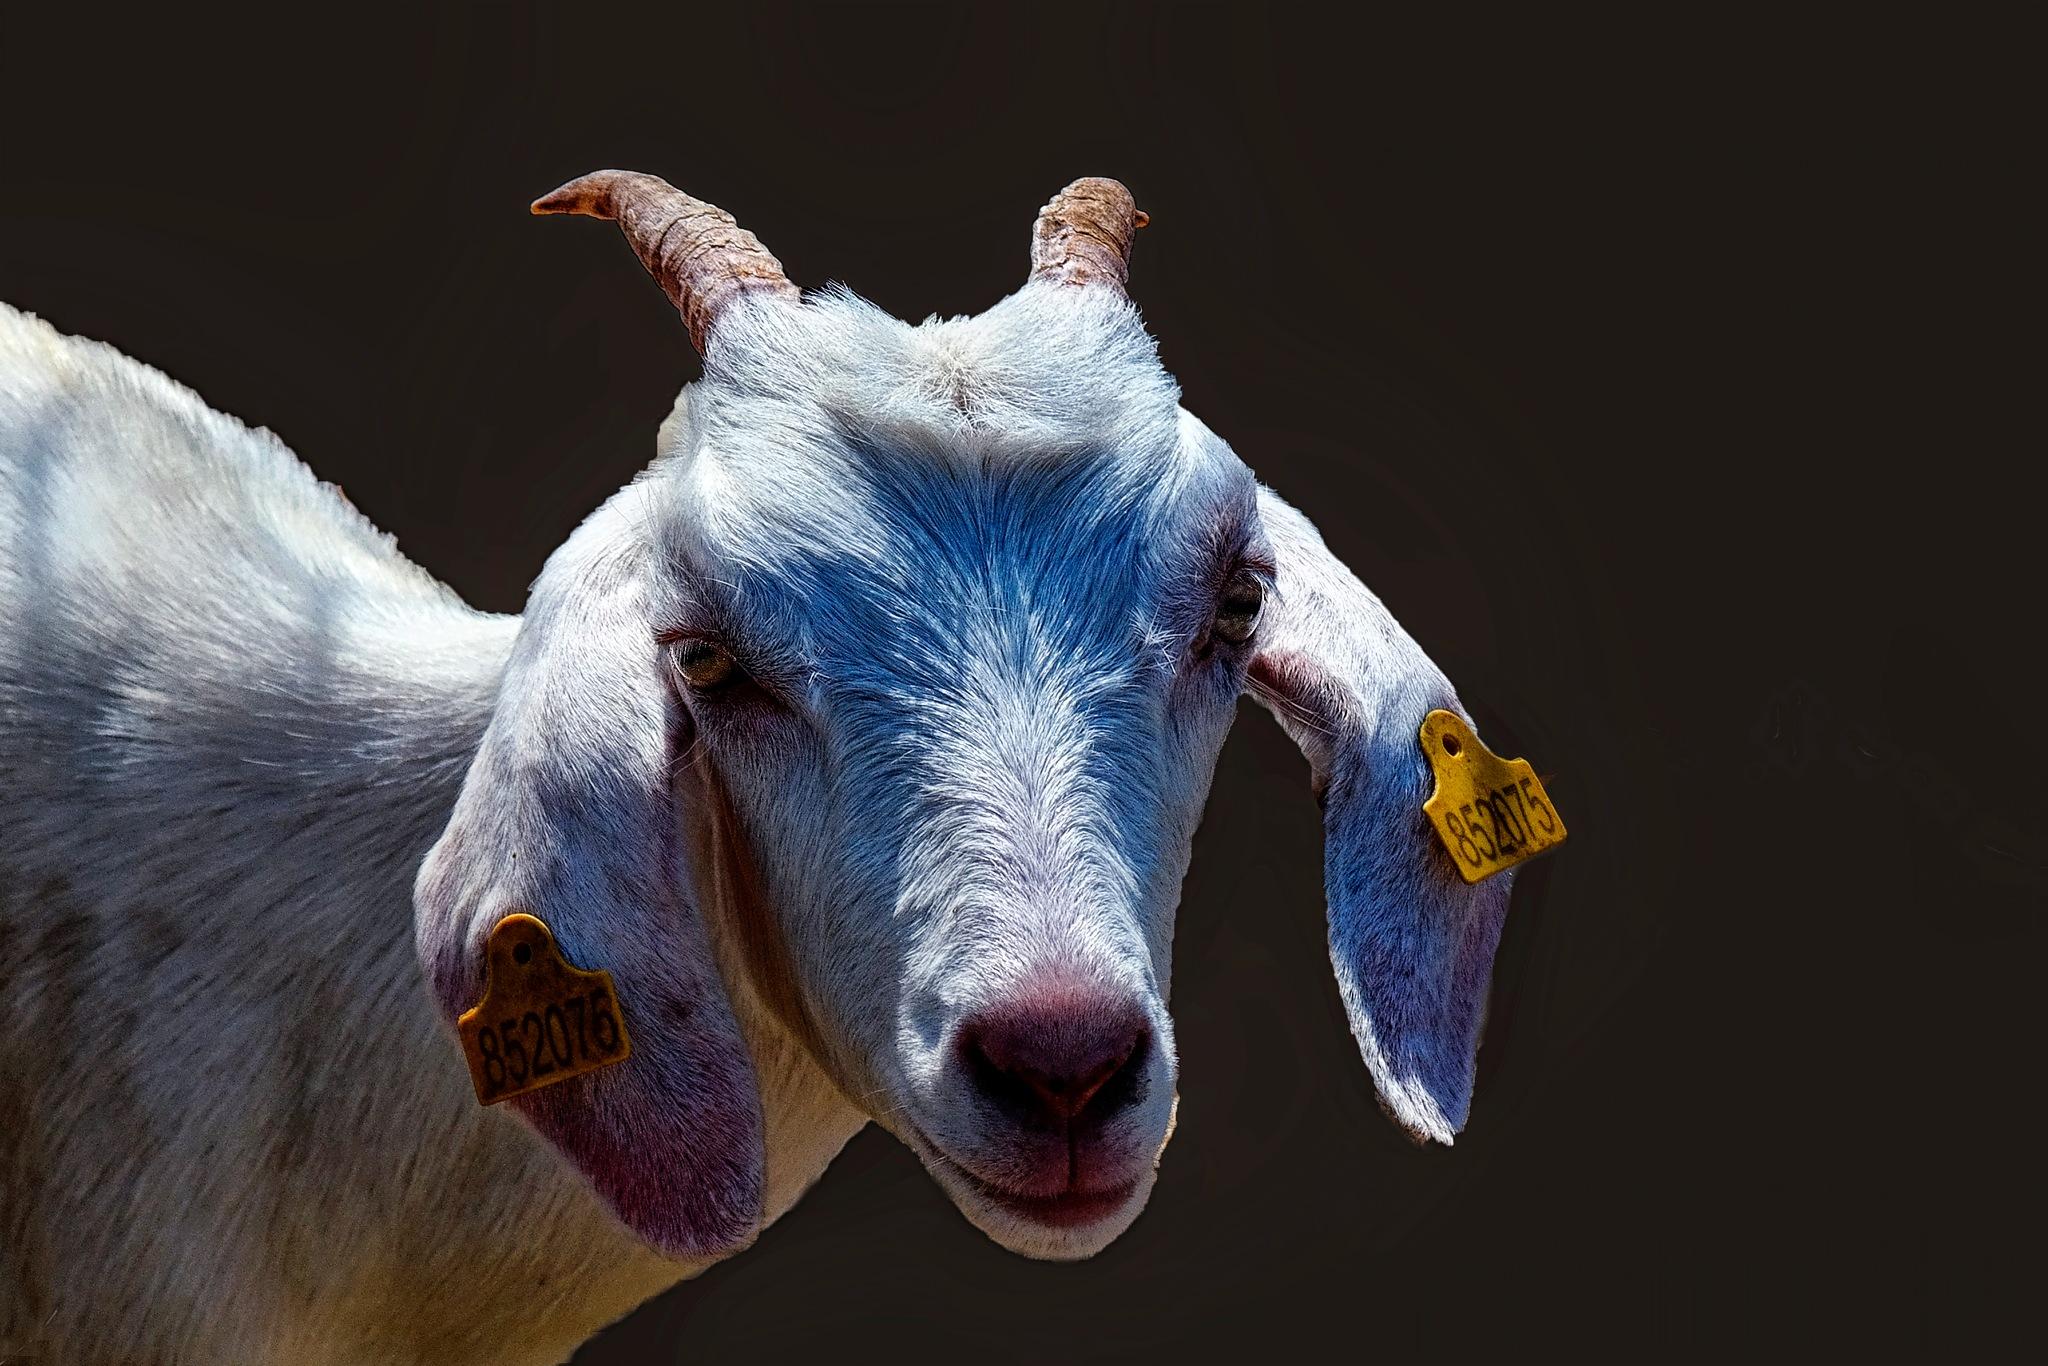 lamb-portrait by Muhsin Özcan